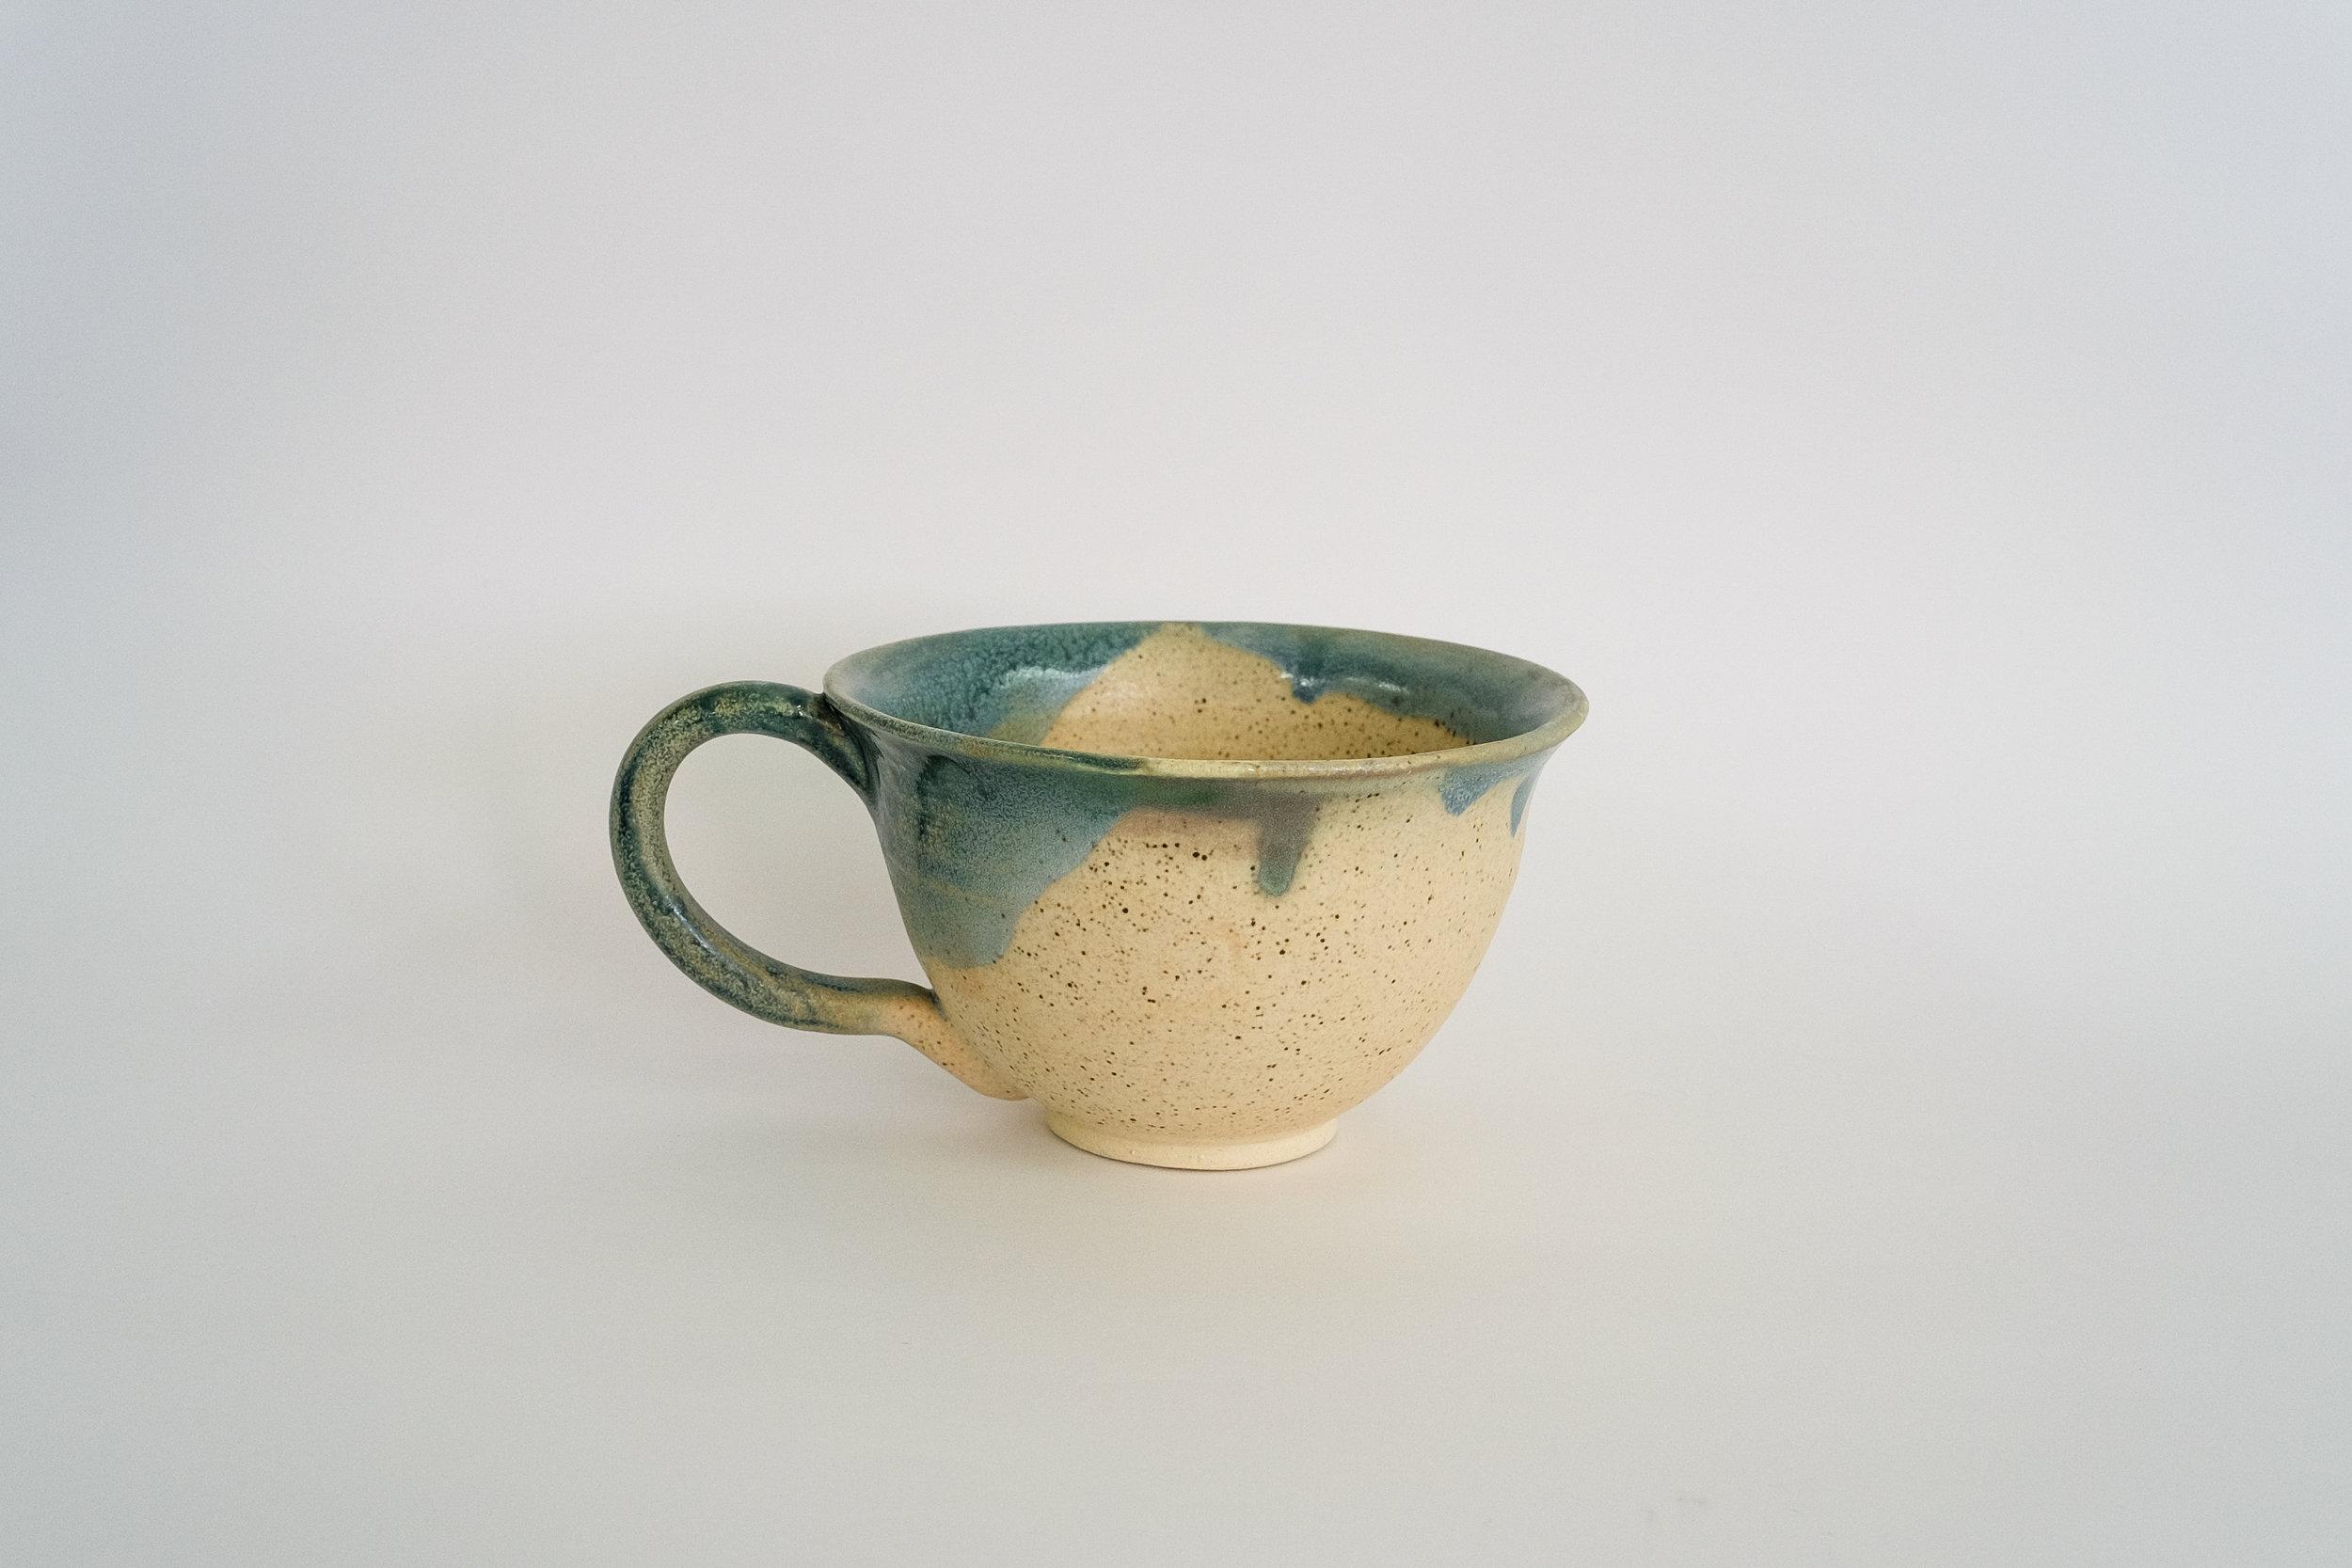 石器茶杯 Stoneware Teacup 2016